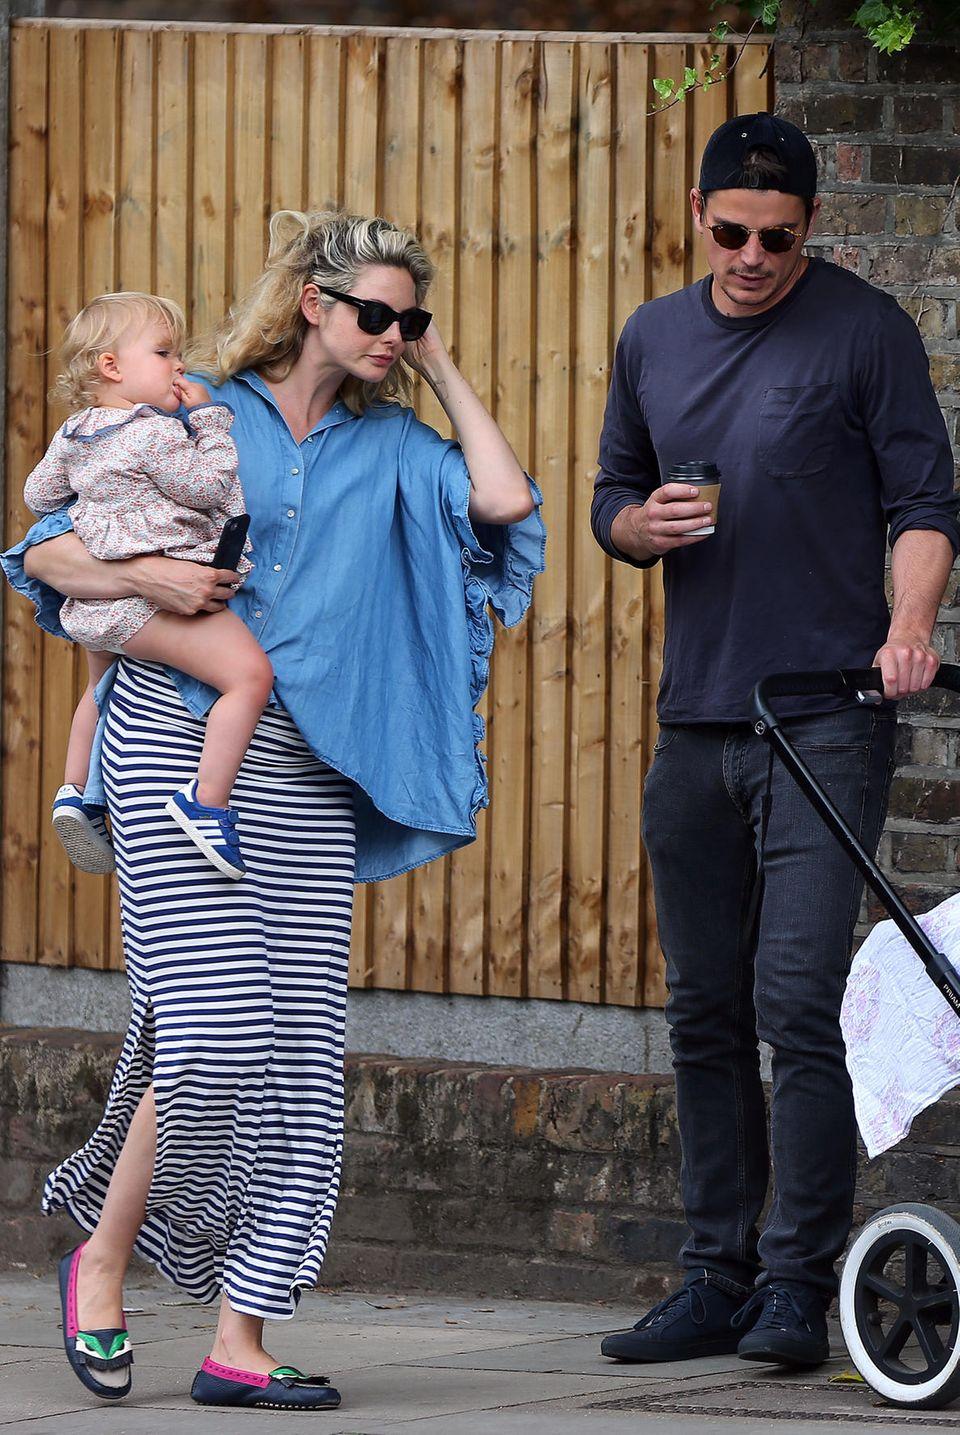 Josh Hartnett undTamsin Egerton mit ihren Kindern